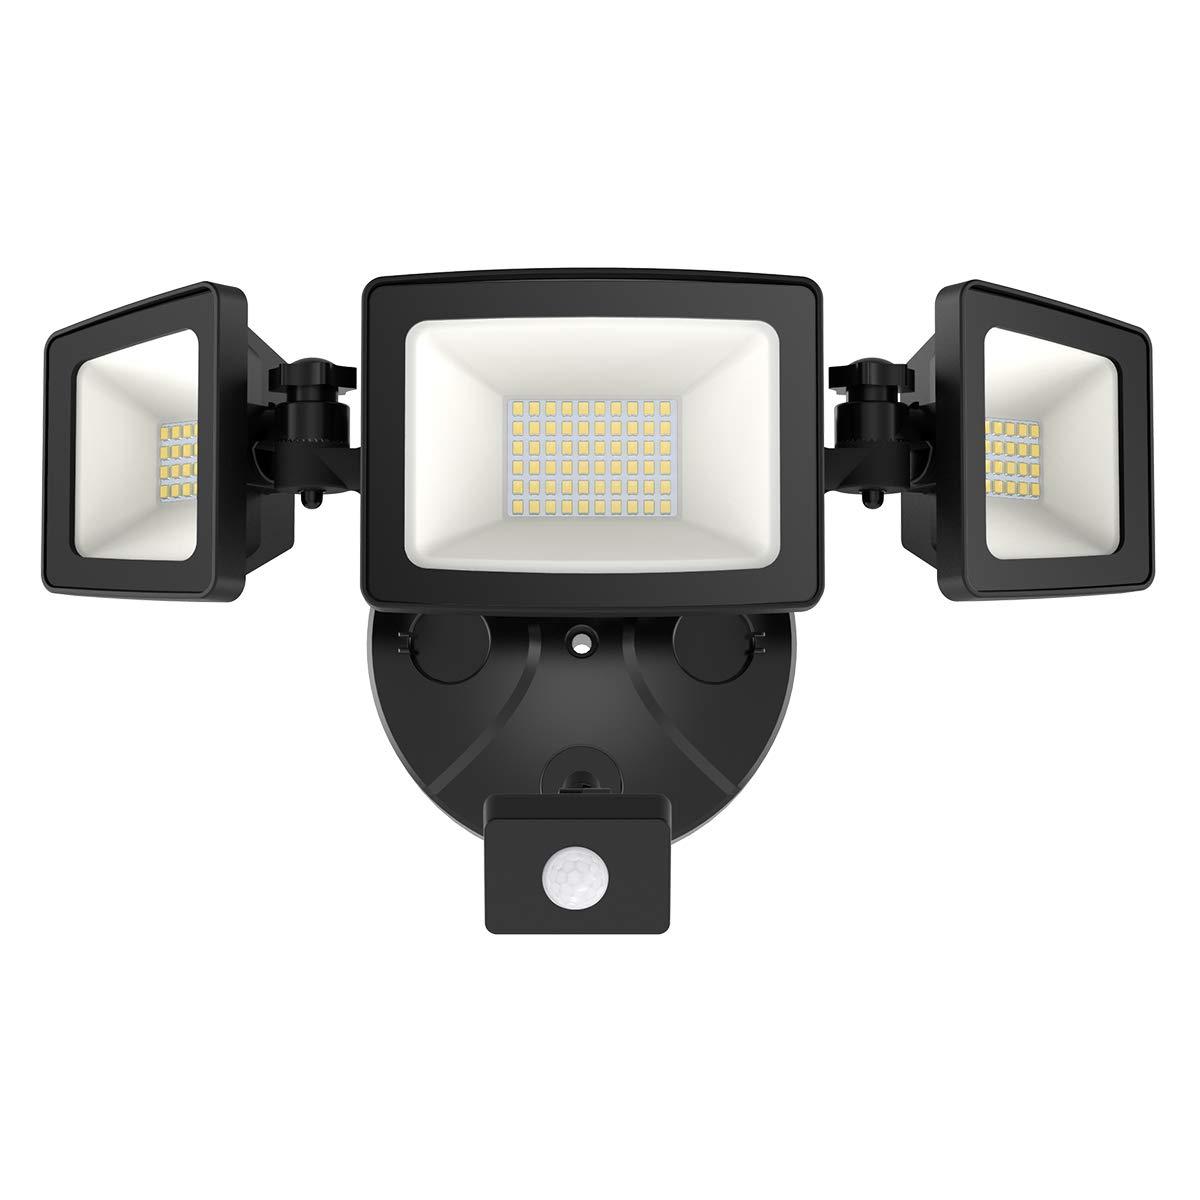 Onforu 50W LED Security Lights with Motion Sensor, Three Head Outdoor Indoor Flood Light 5000 Lumens 5000k IP65 Waterproof Floodlights for Entryways Stairs Yard Garage, Black by Onforu